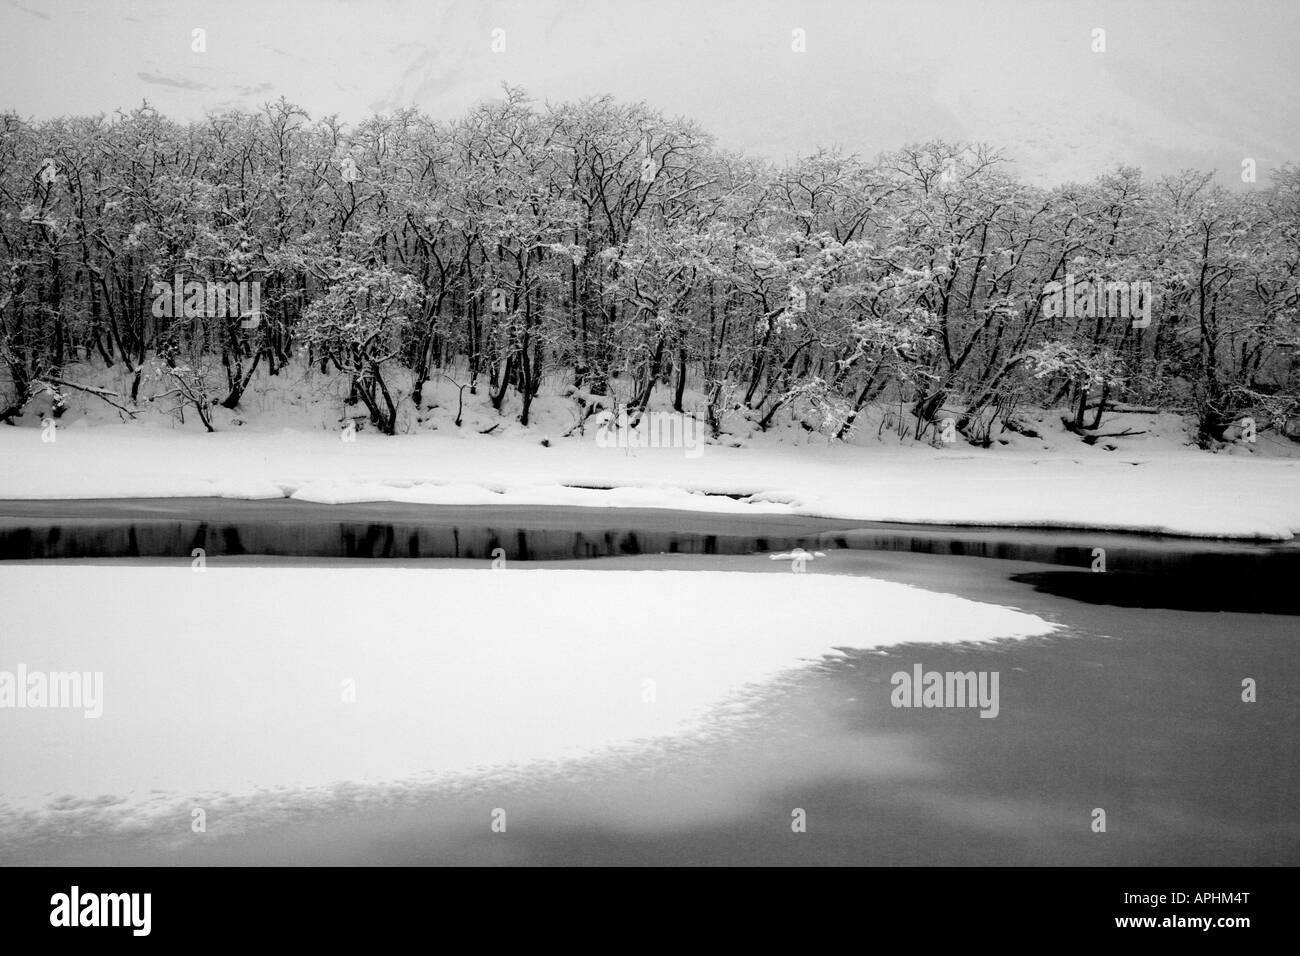 River Rauma after snowfall in the Romsdalen valley, Rauma kommune, Møre og Romsdal, Norway. - Stock Image